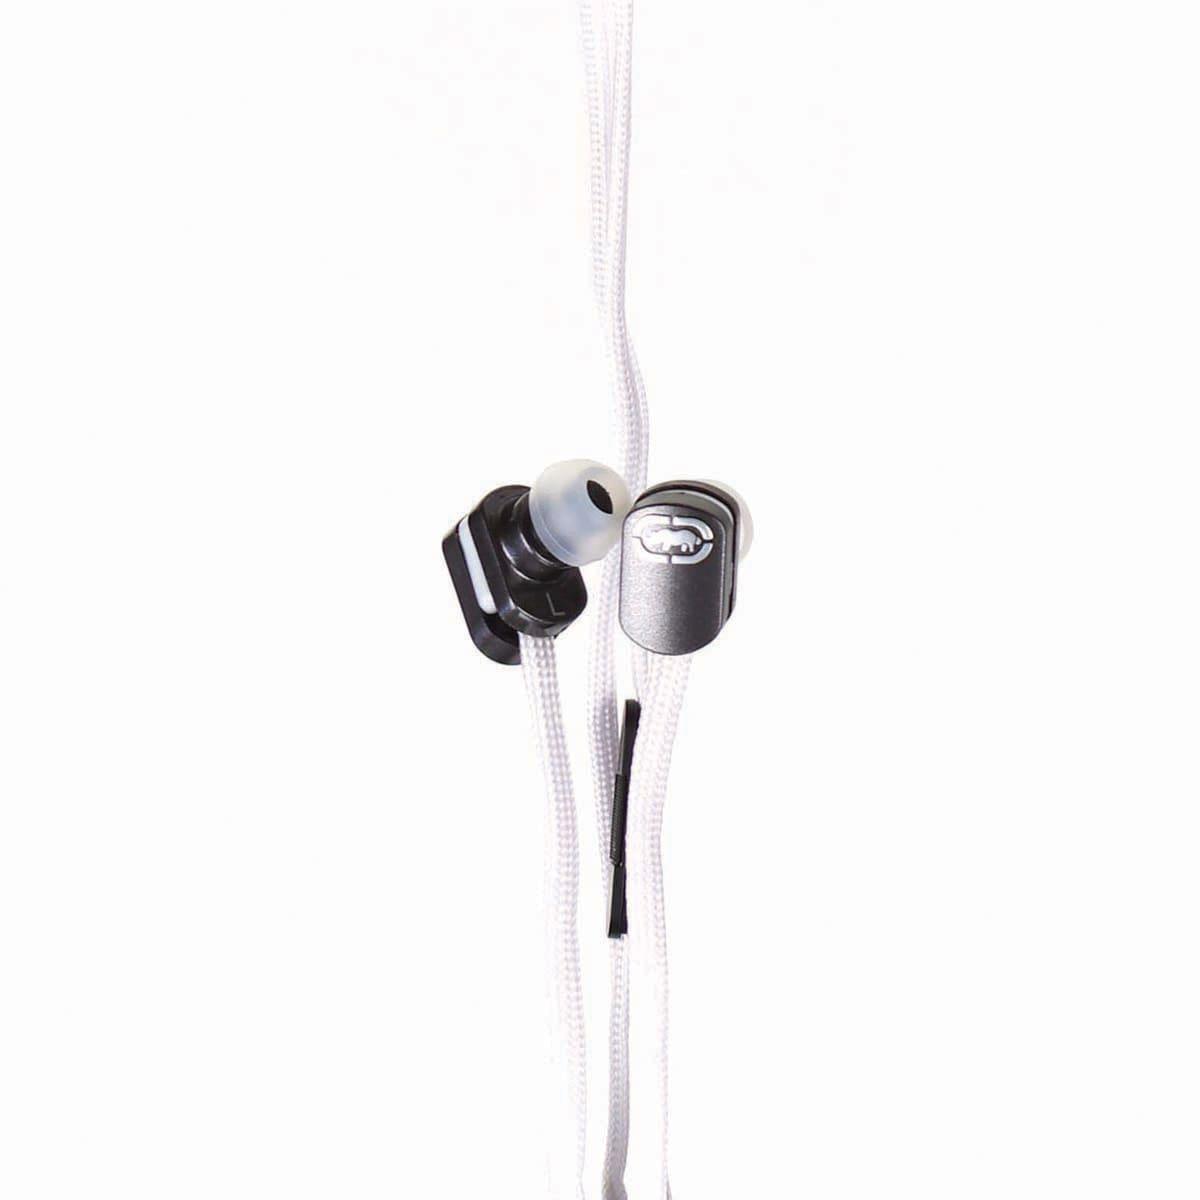 Marc Ecko Black Silicone Earbud on White Nylon Shoelace Cable